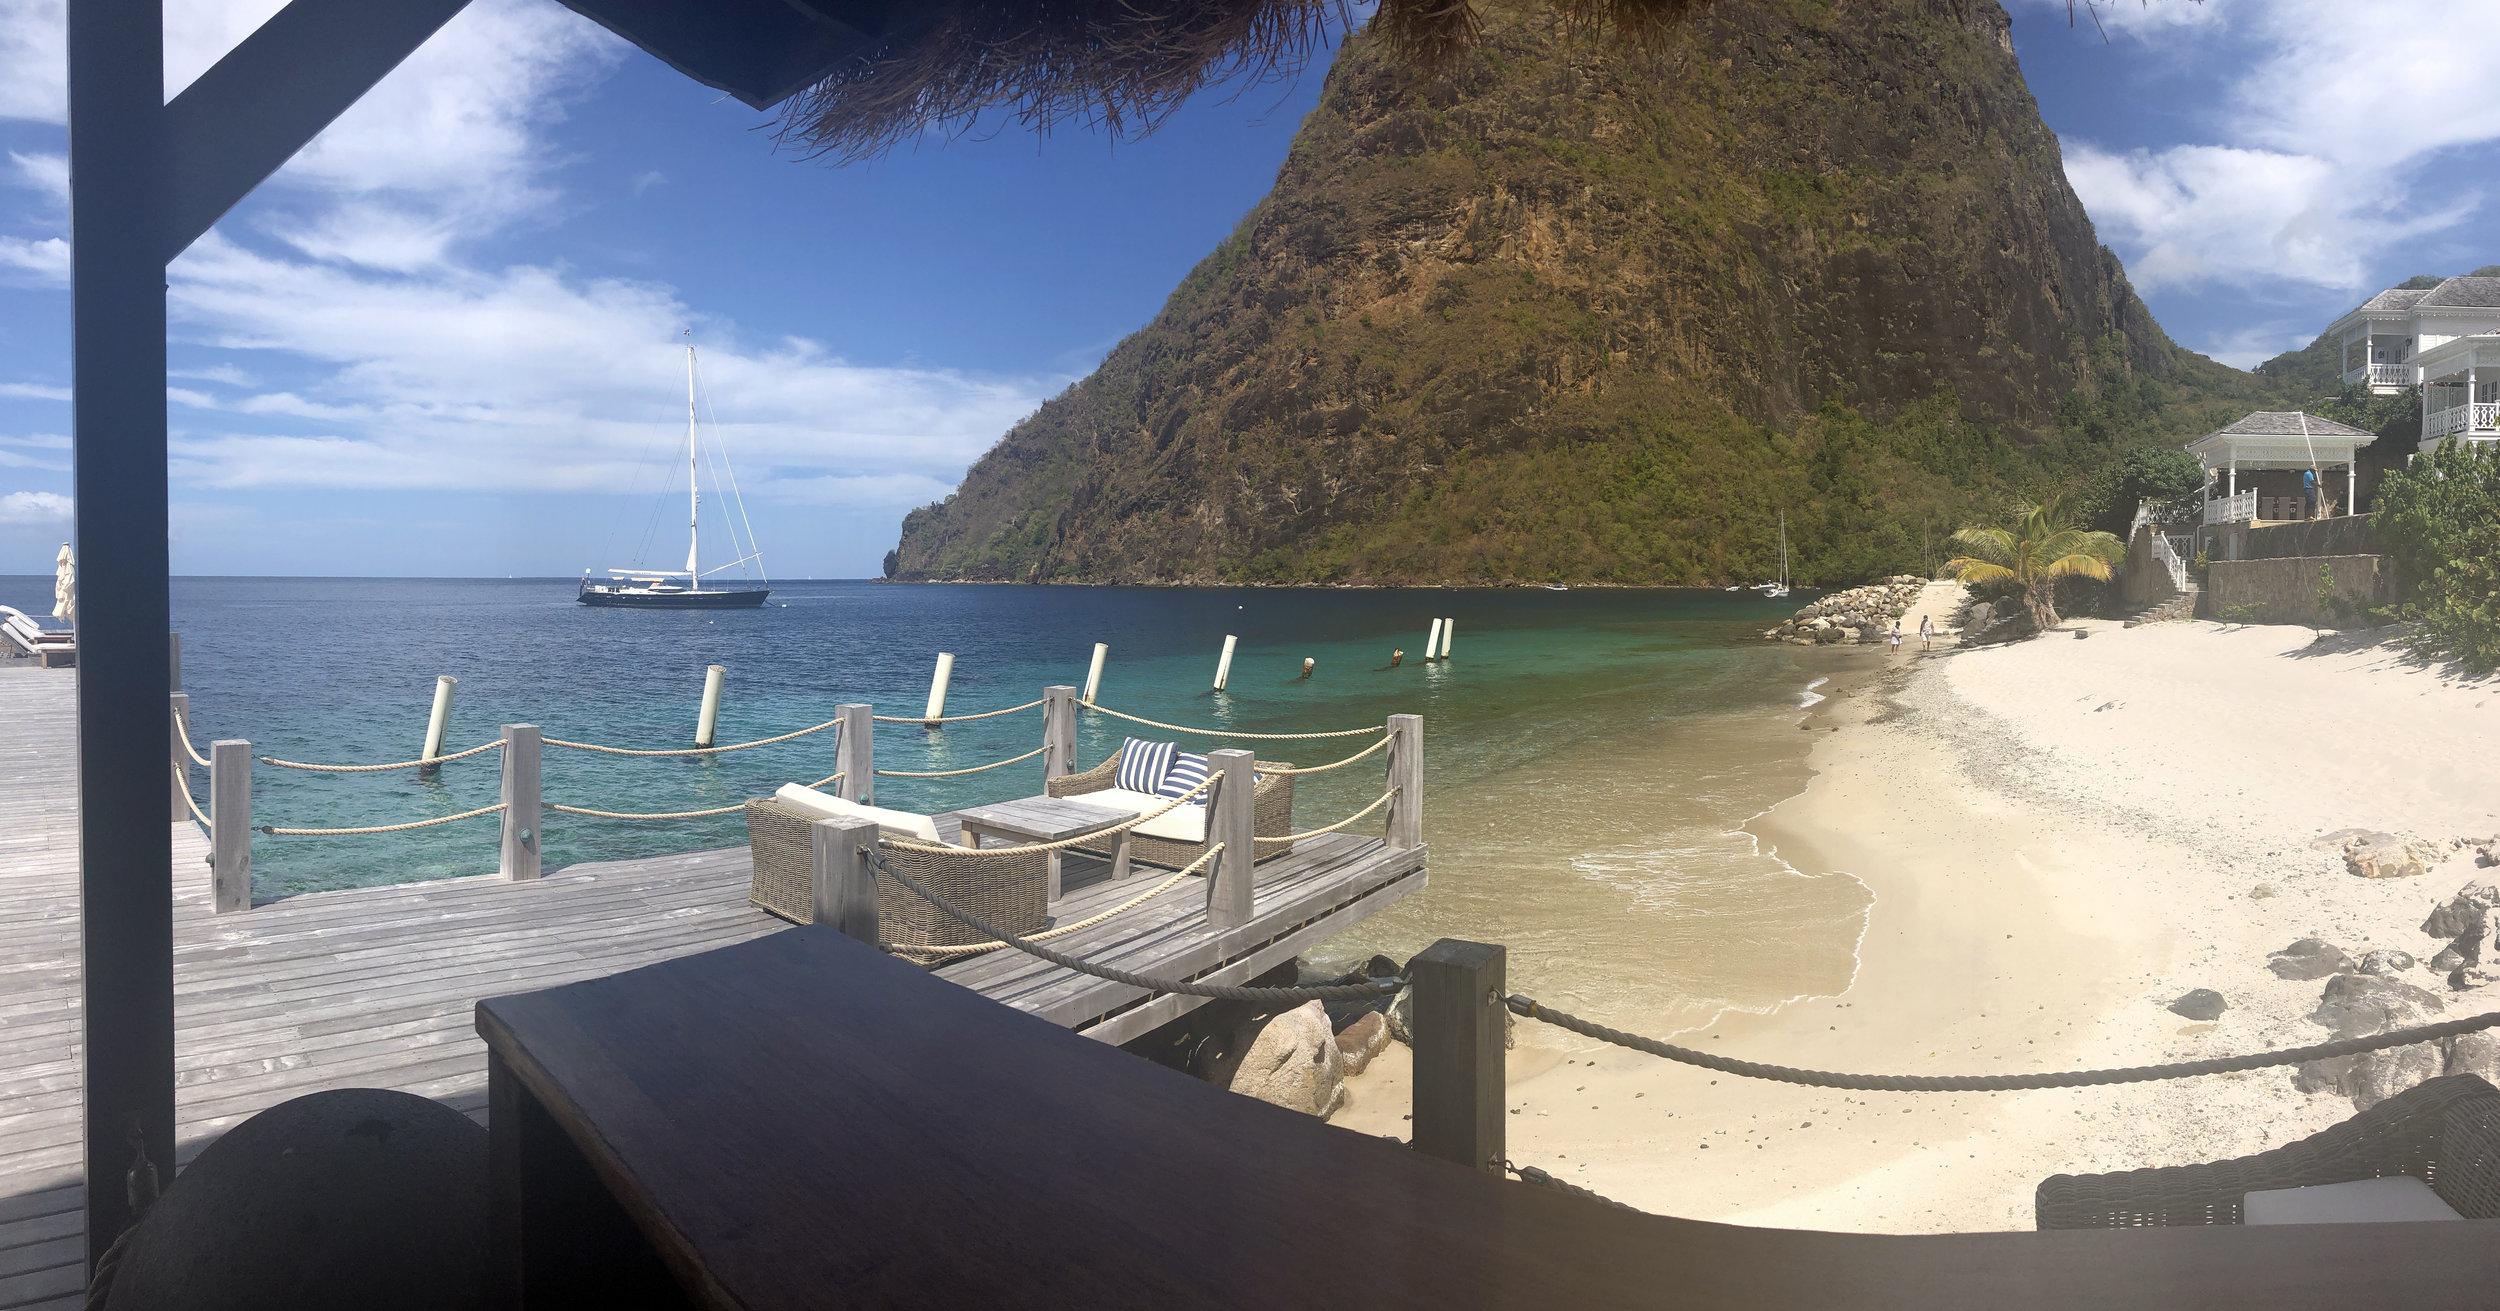 02 07 St Lucia 042.jpg